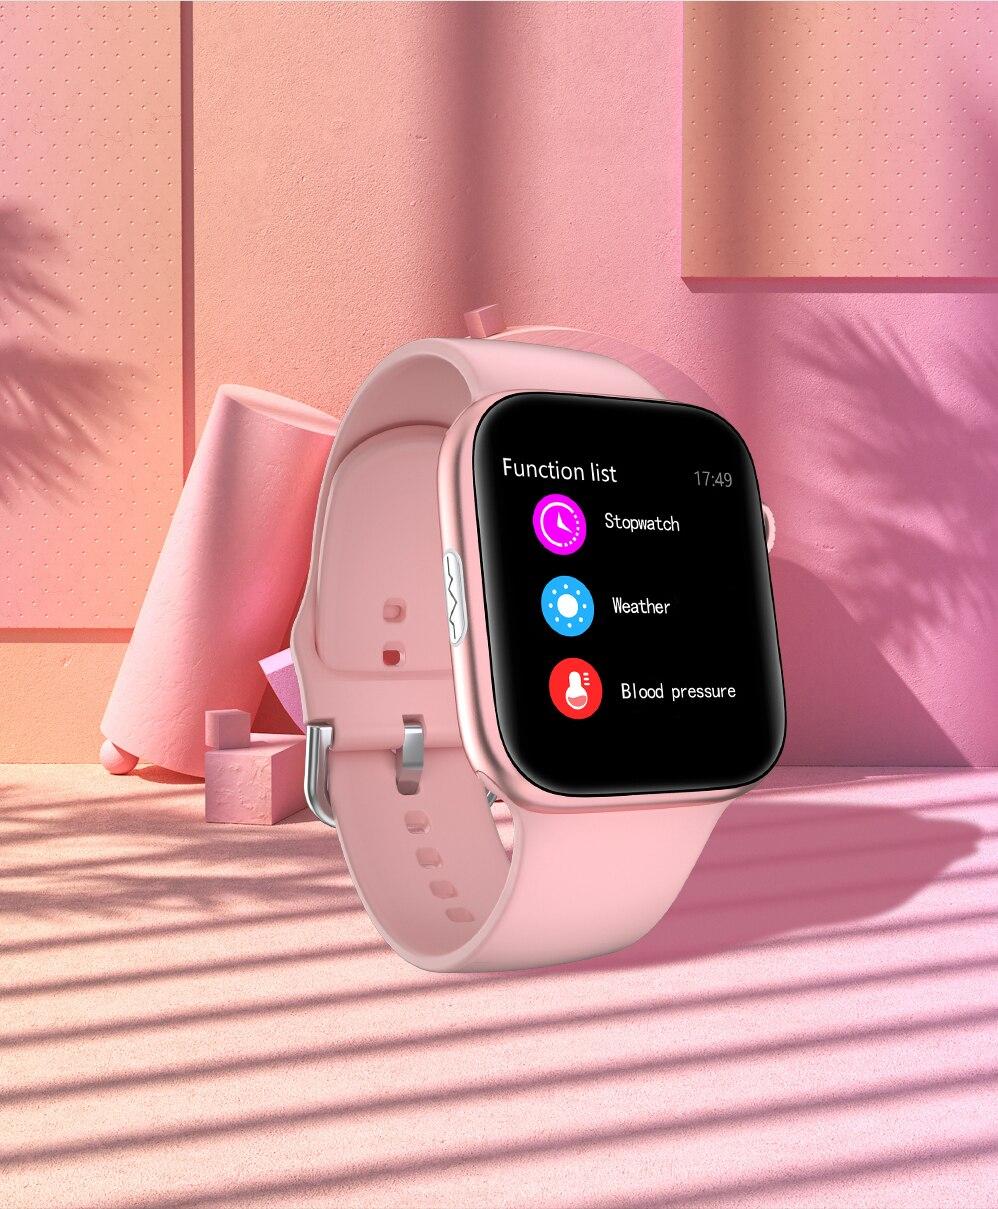 Hfda27463375b4c368257004533002266p ECG Heart Rate Monitor Smart Watch 2020 Full Touch Screen SE03